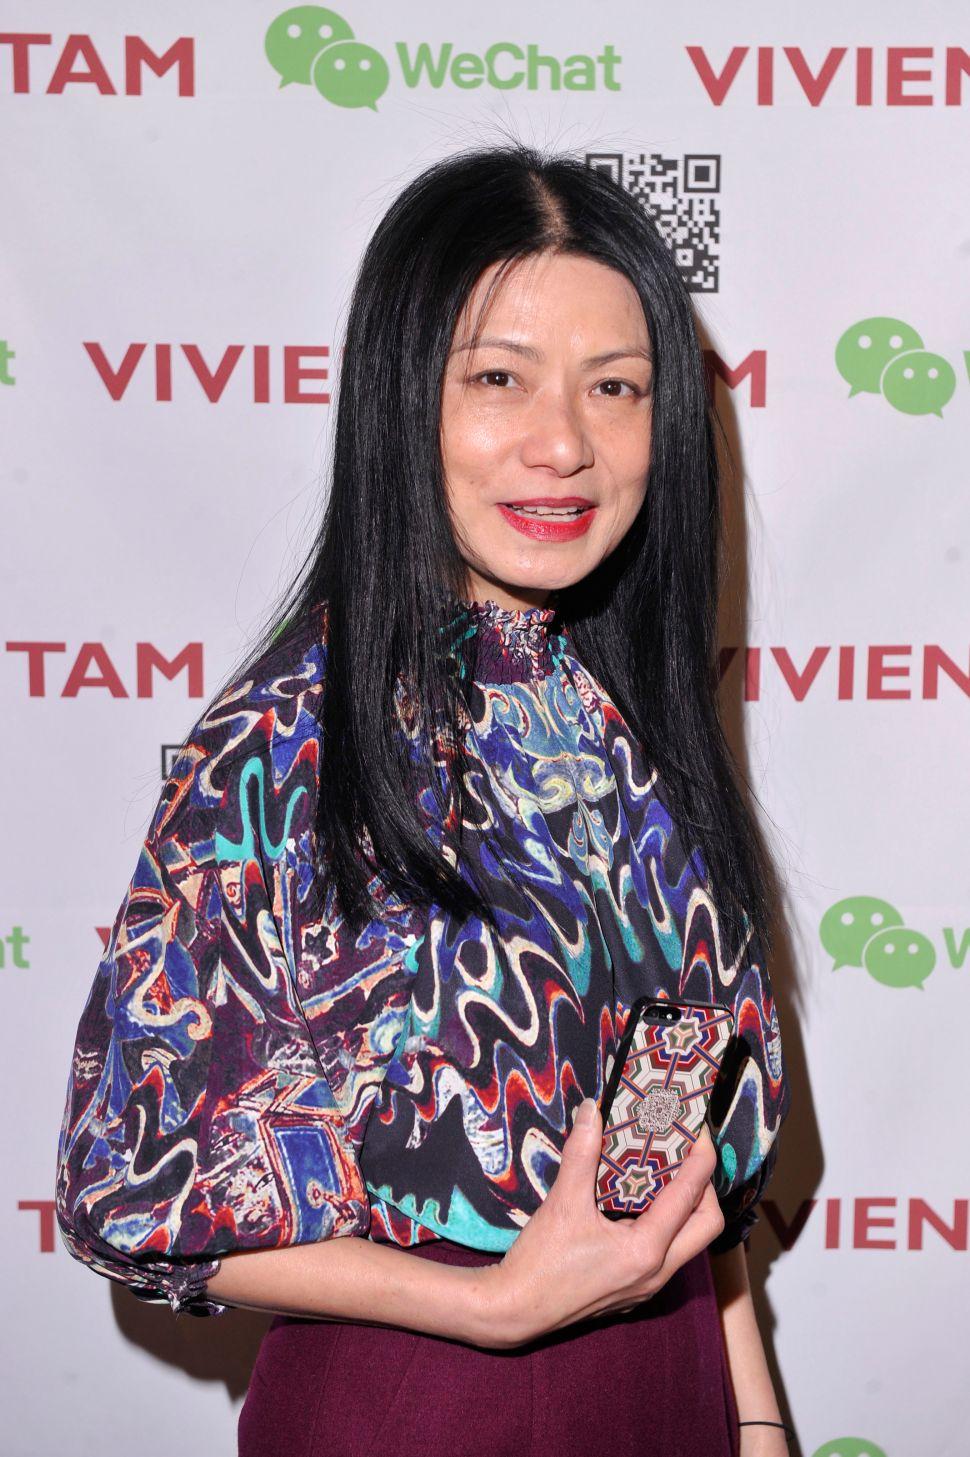 East Meets Tech: Vivienne Tam Joins Forces With WeChat App